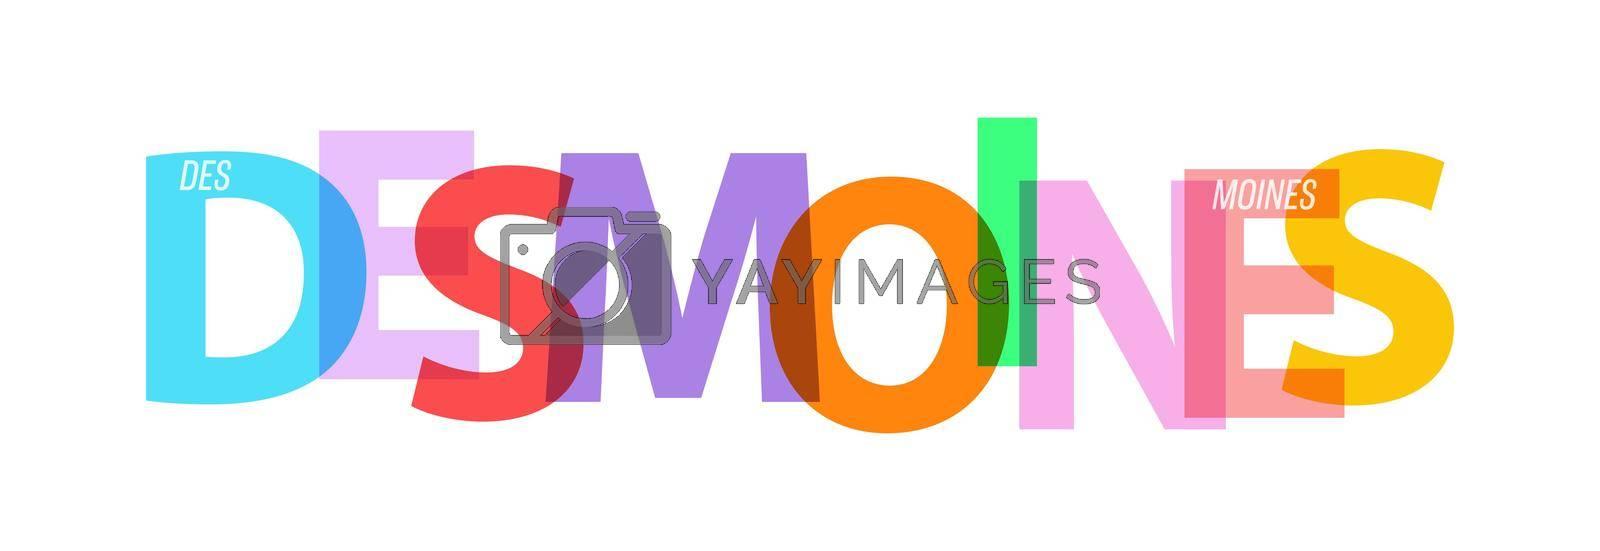 DES MOINES. Lettering on a white background. Vector design template for poster, map, banner. Vector illustration.